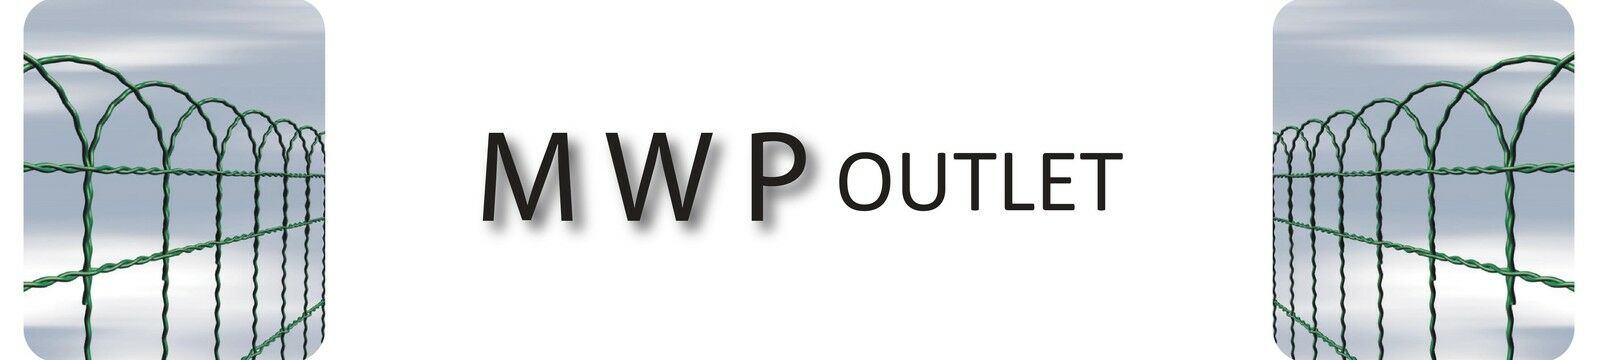 MWPoutlet